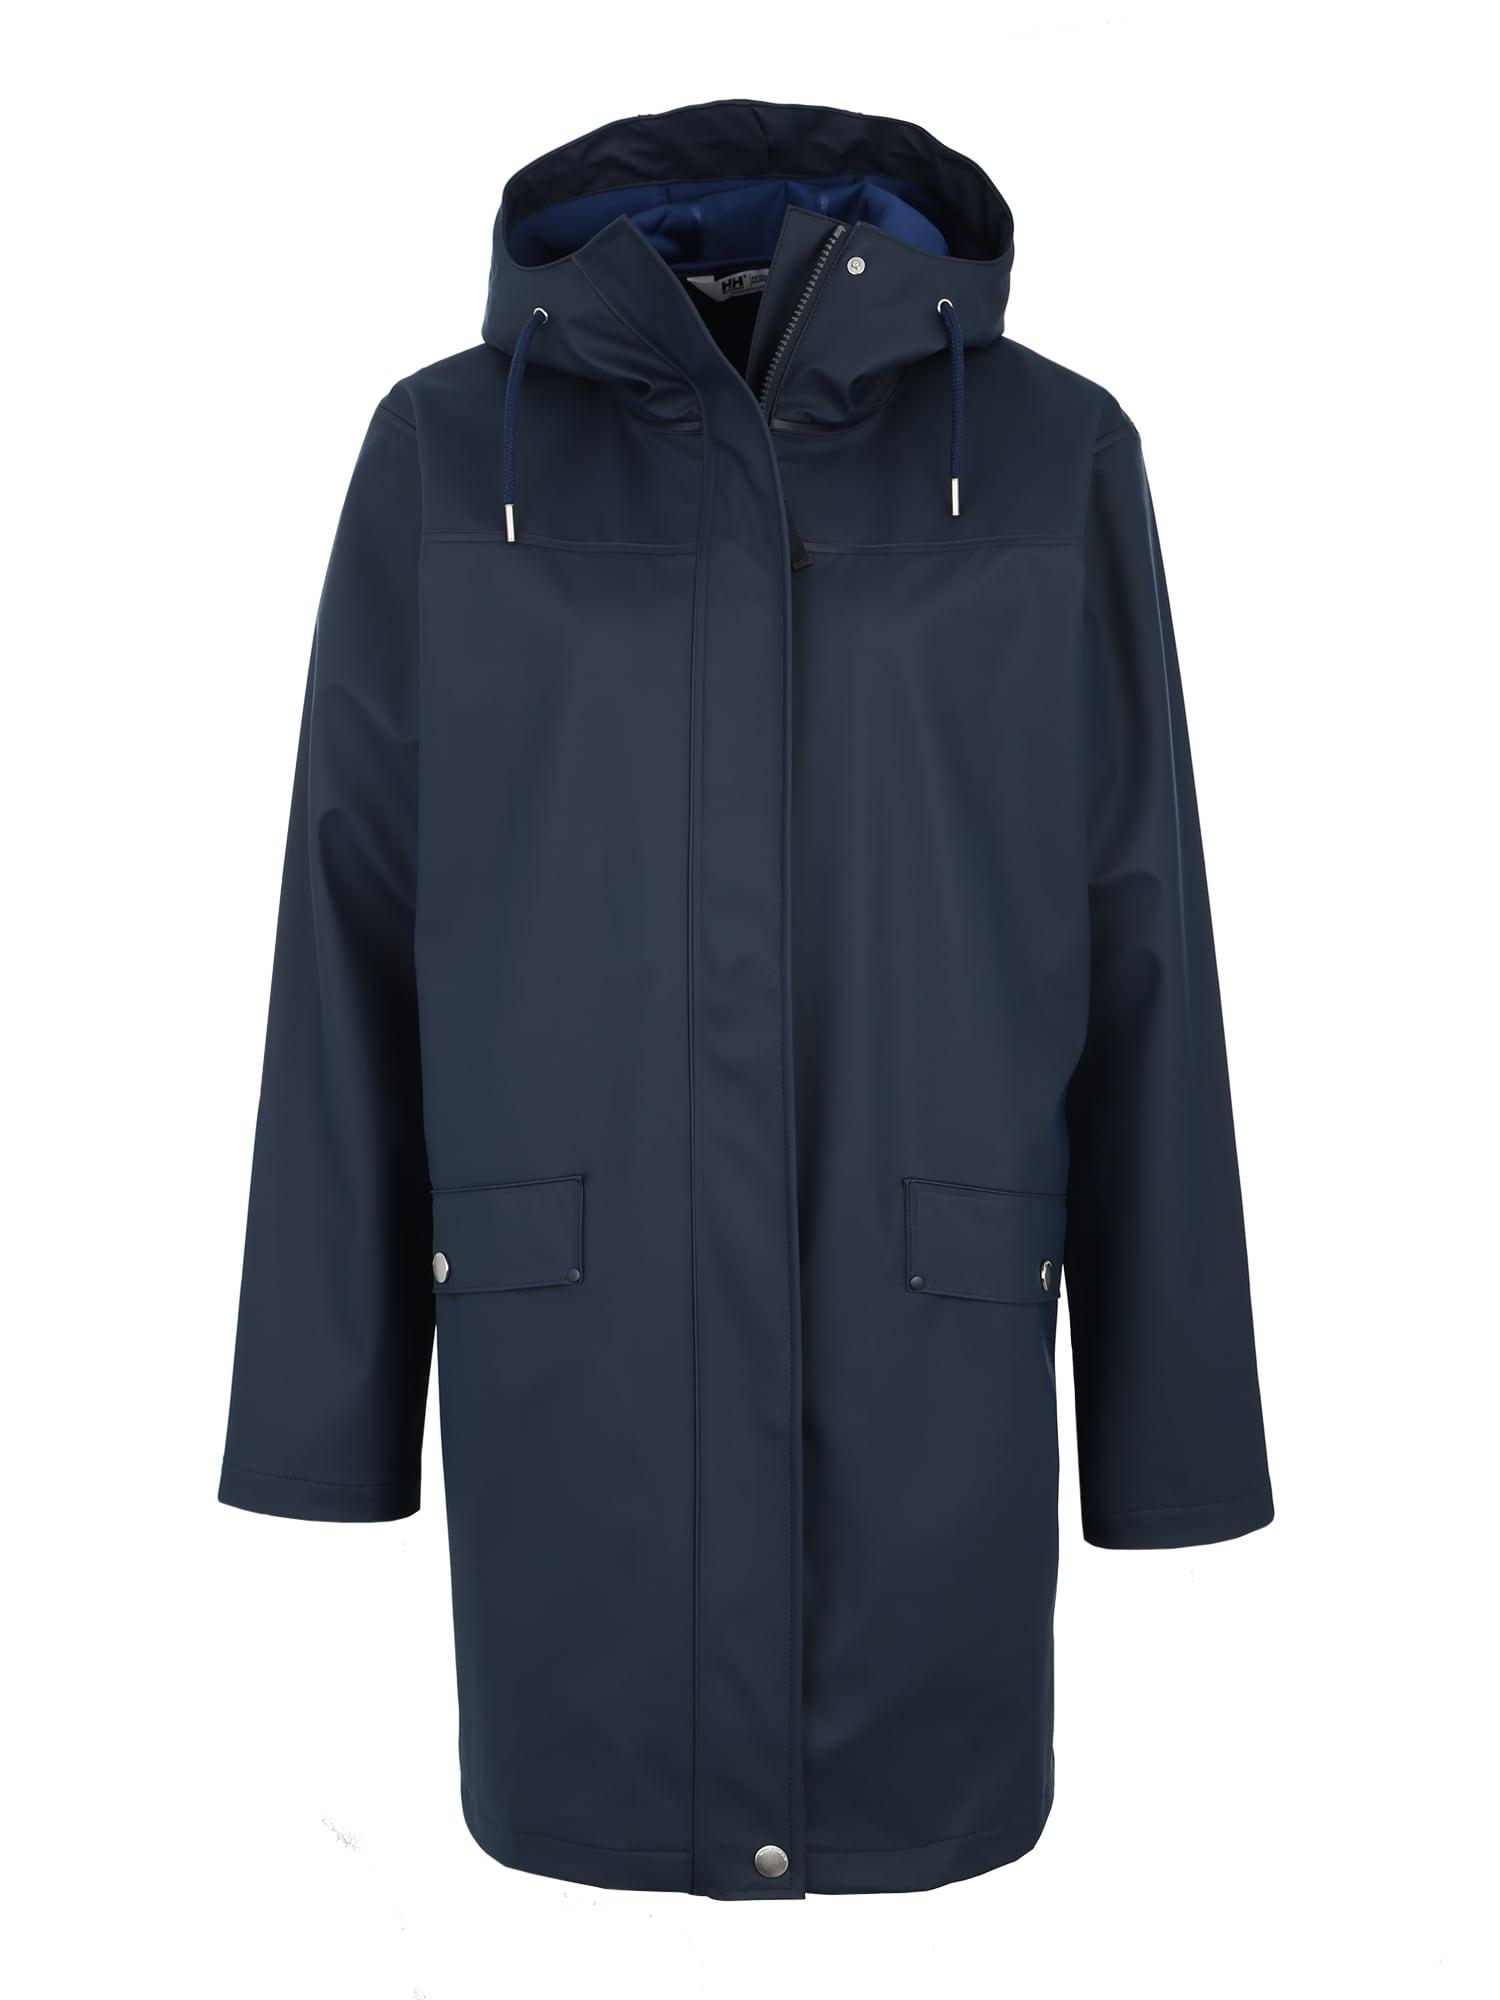 Outdoorový kabát Moss Rain tmavě modrá HELLY HANSEN